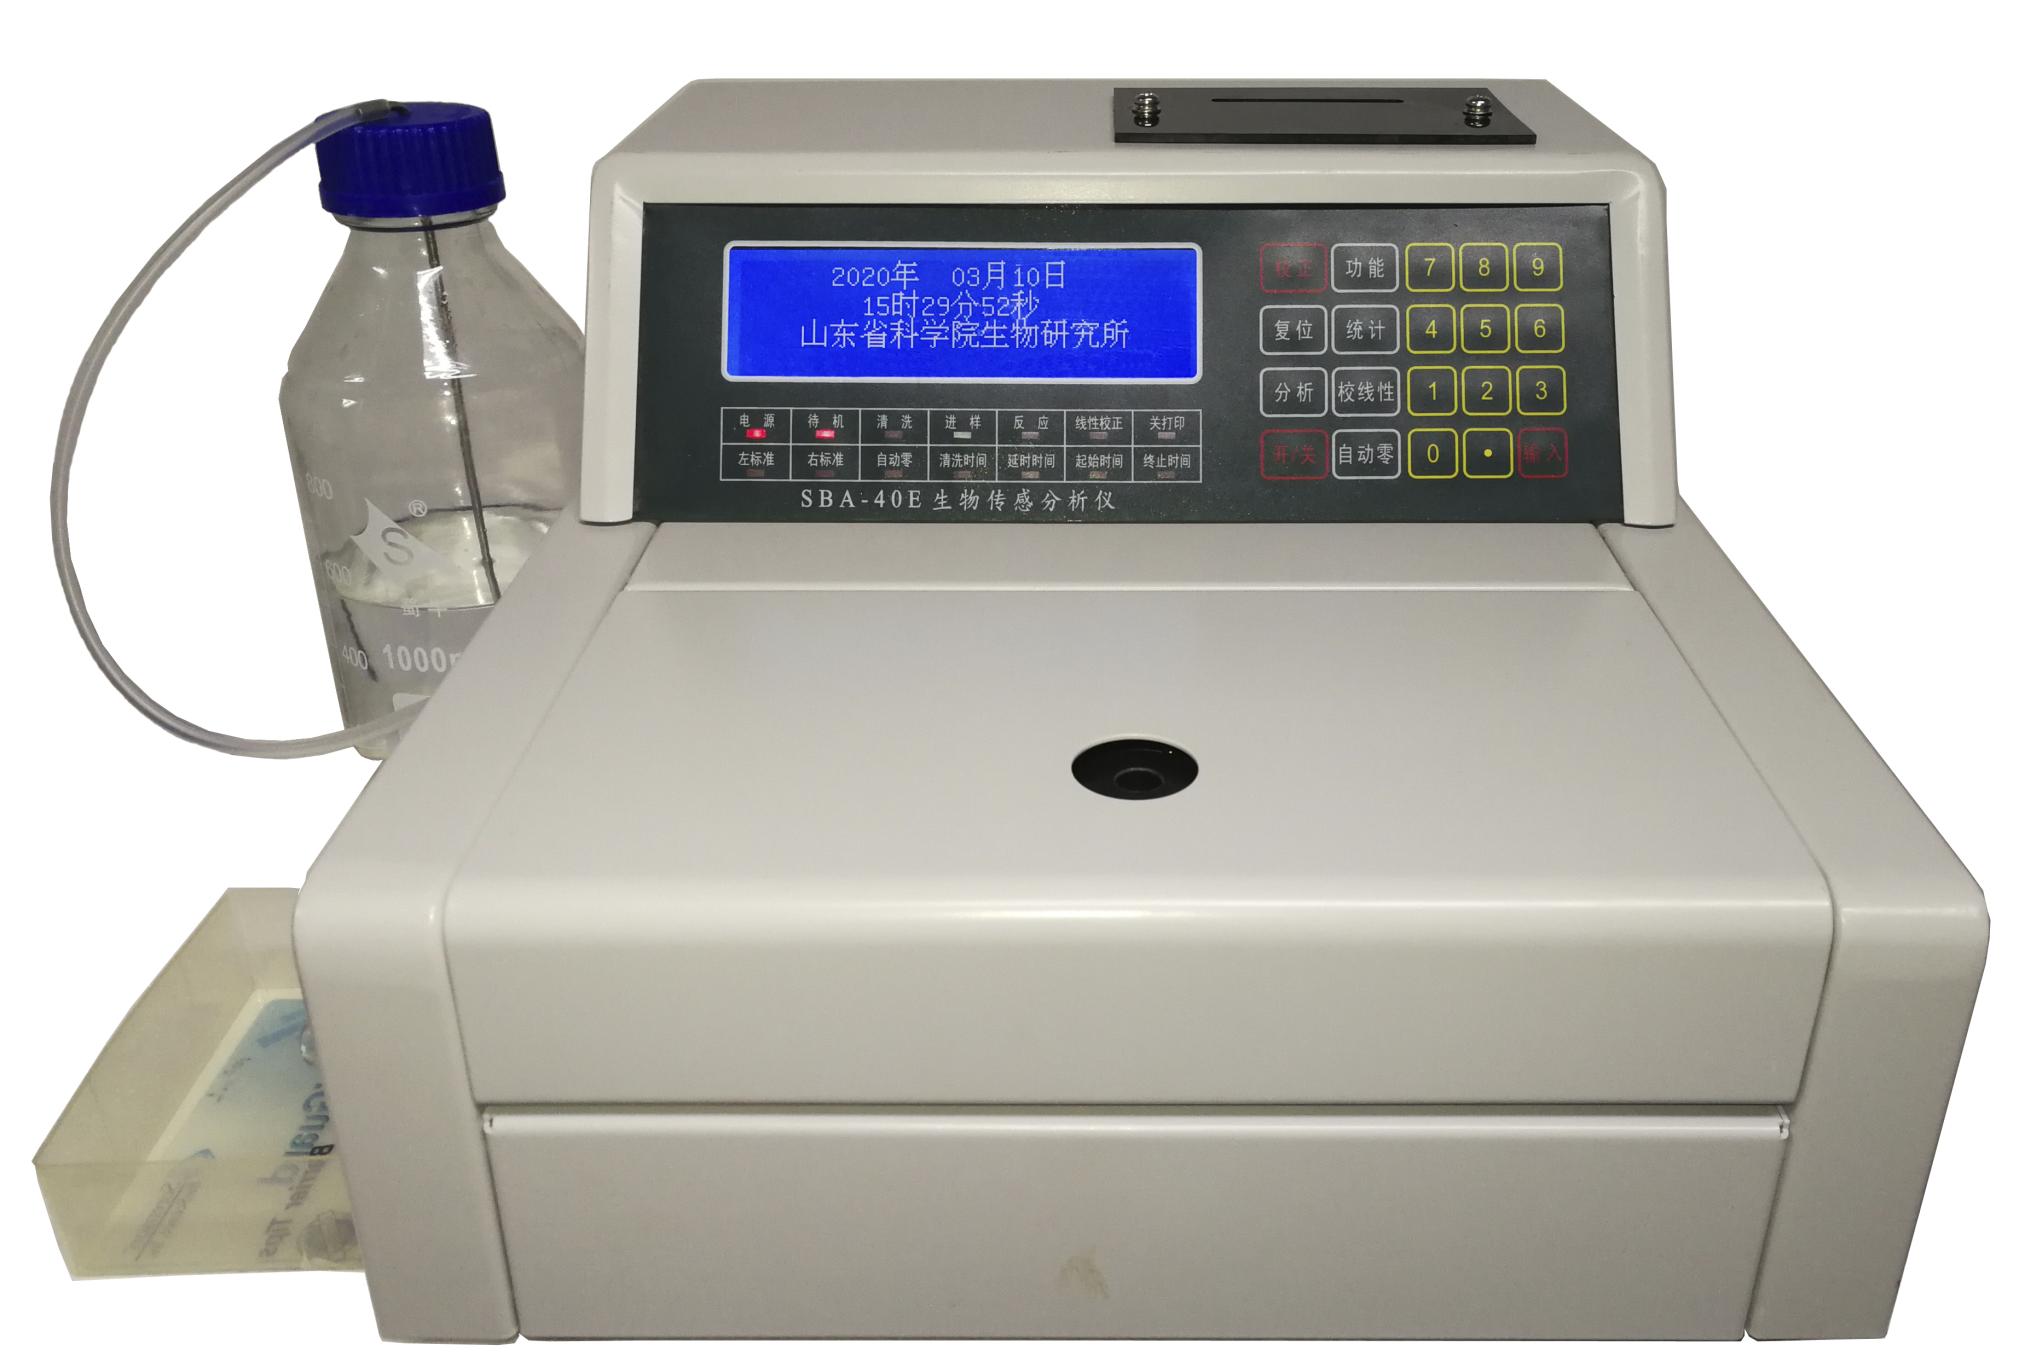 SBA-40E葡萄糖-乳酸/谷氨酸/乙醇/赖氨酸分析仪